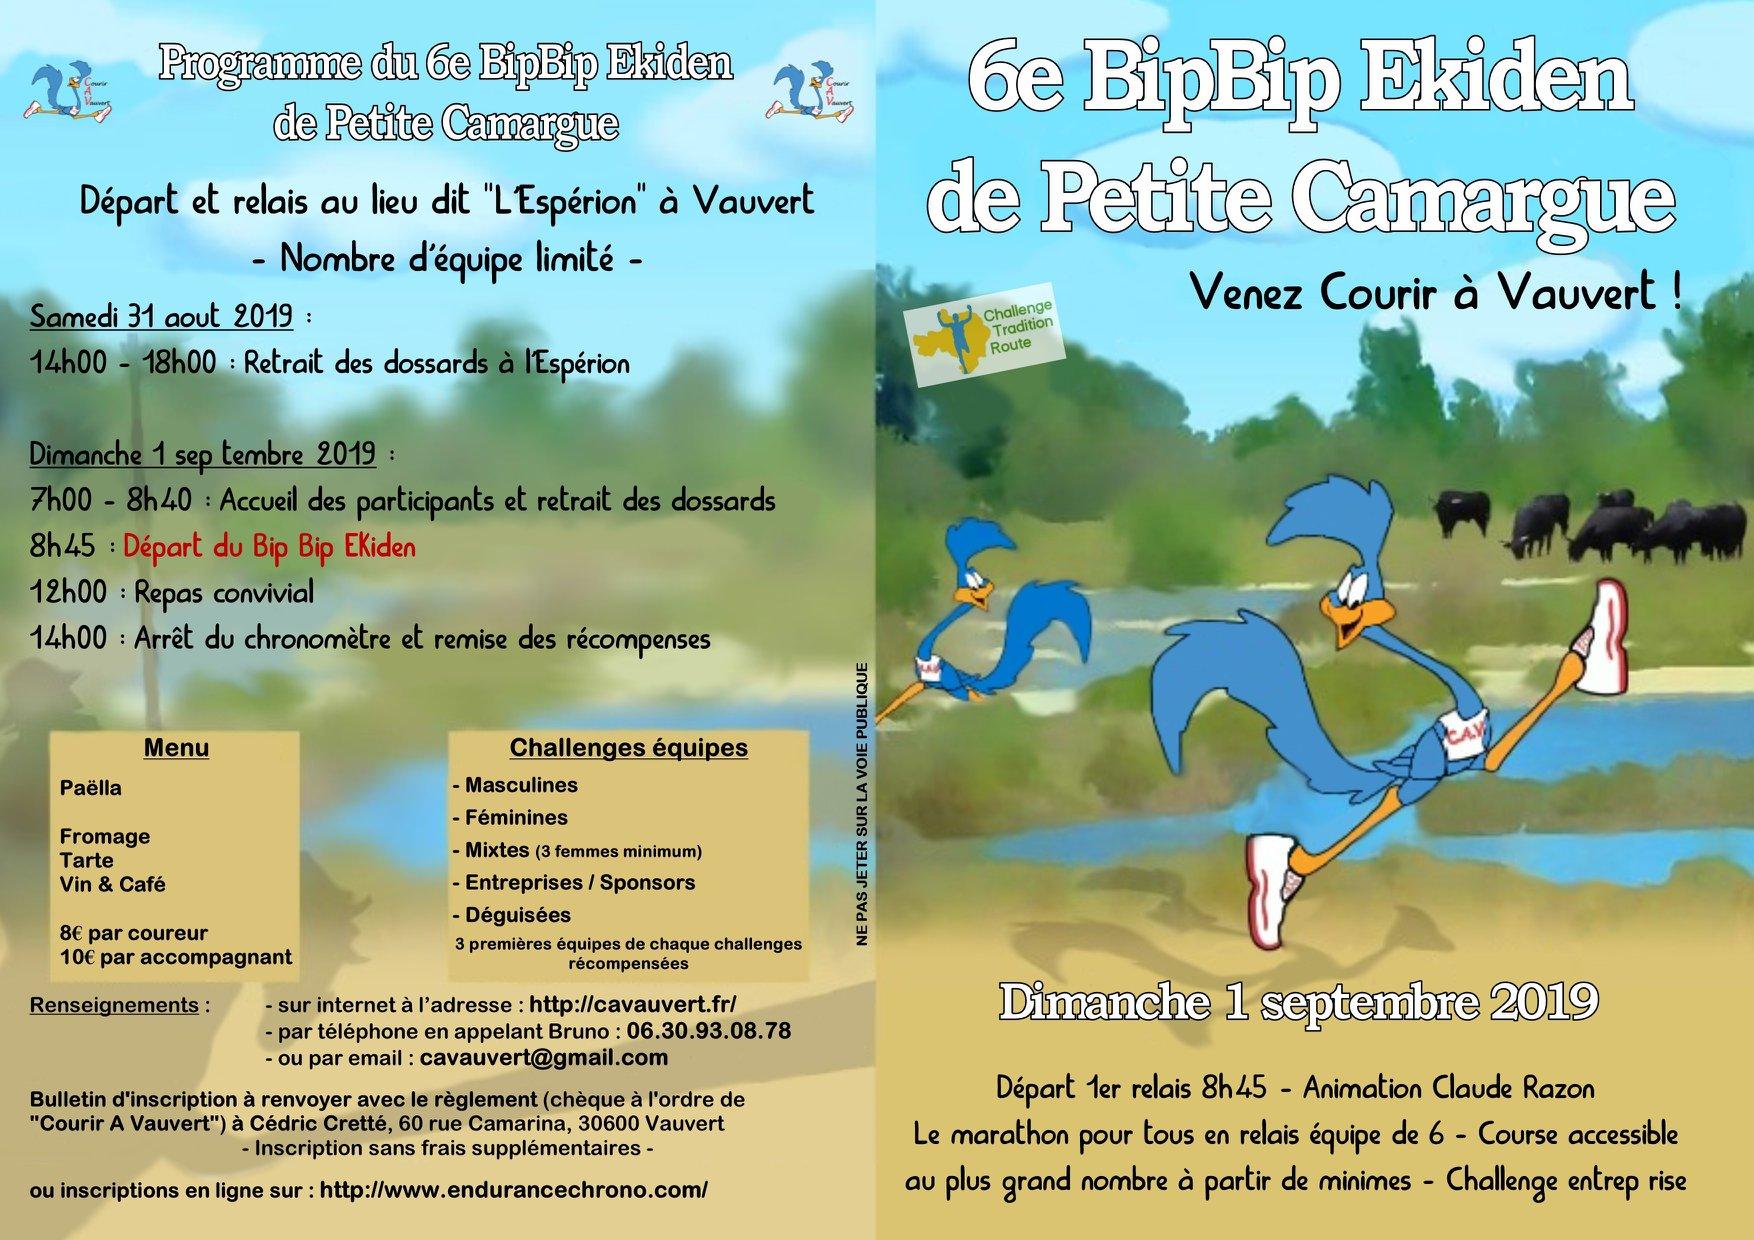 Bip bip Ekiden de Petite Camargue